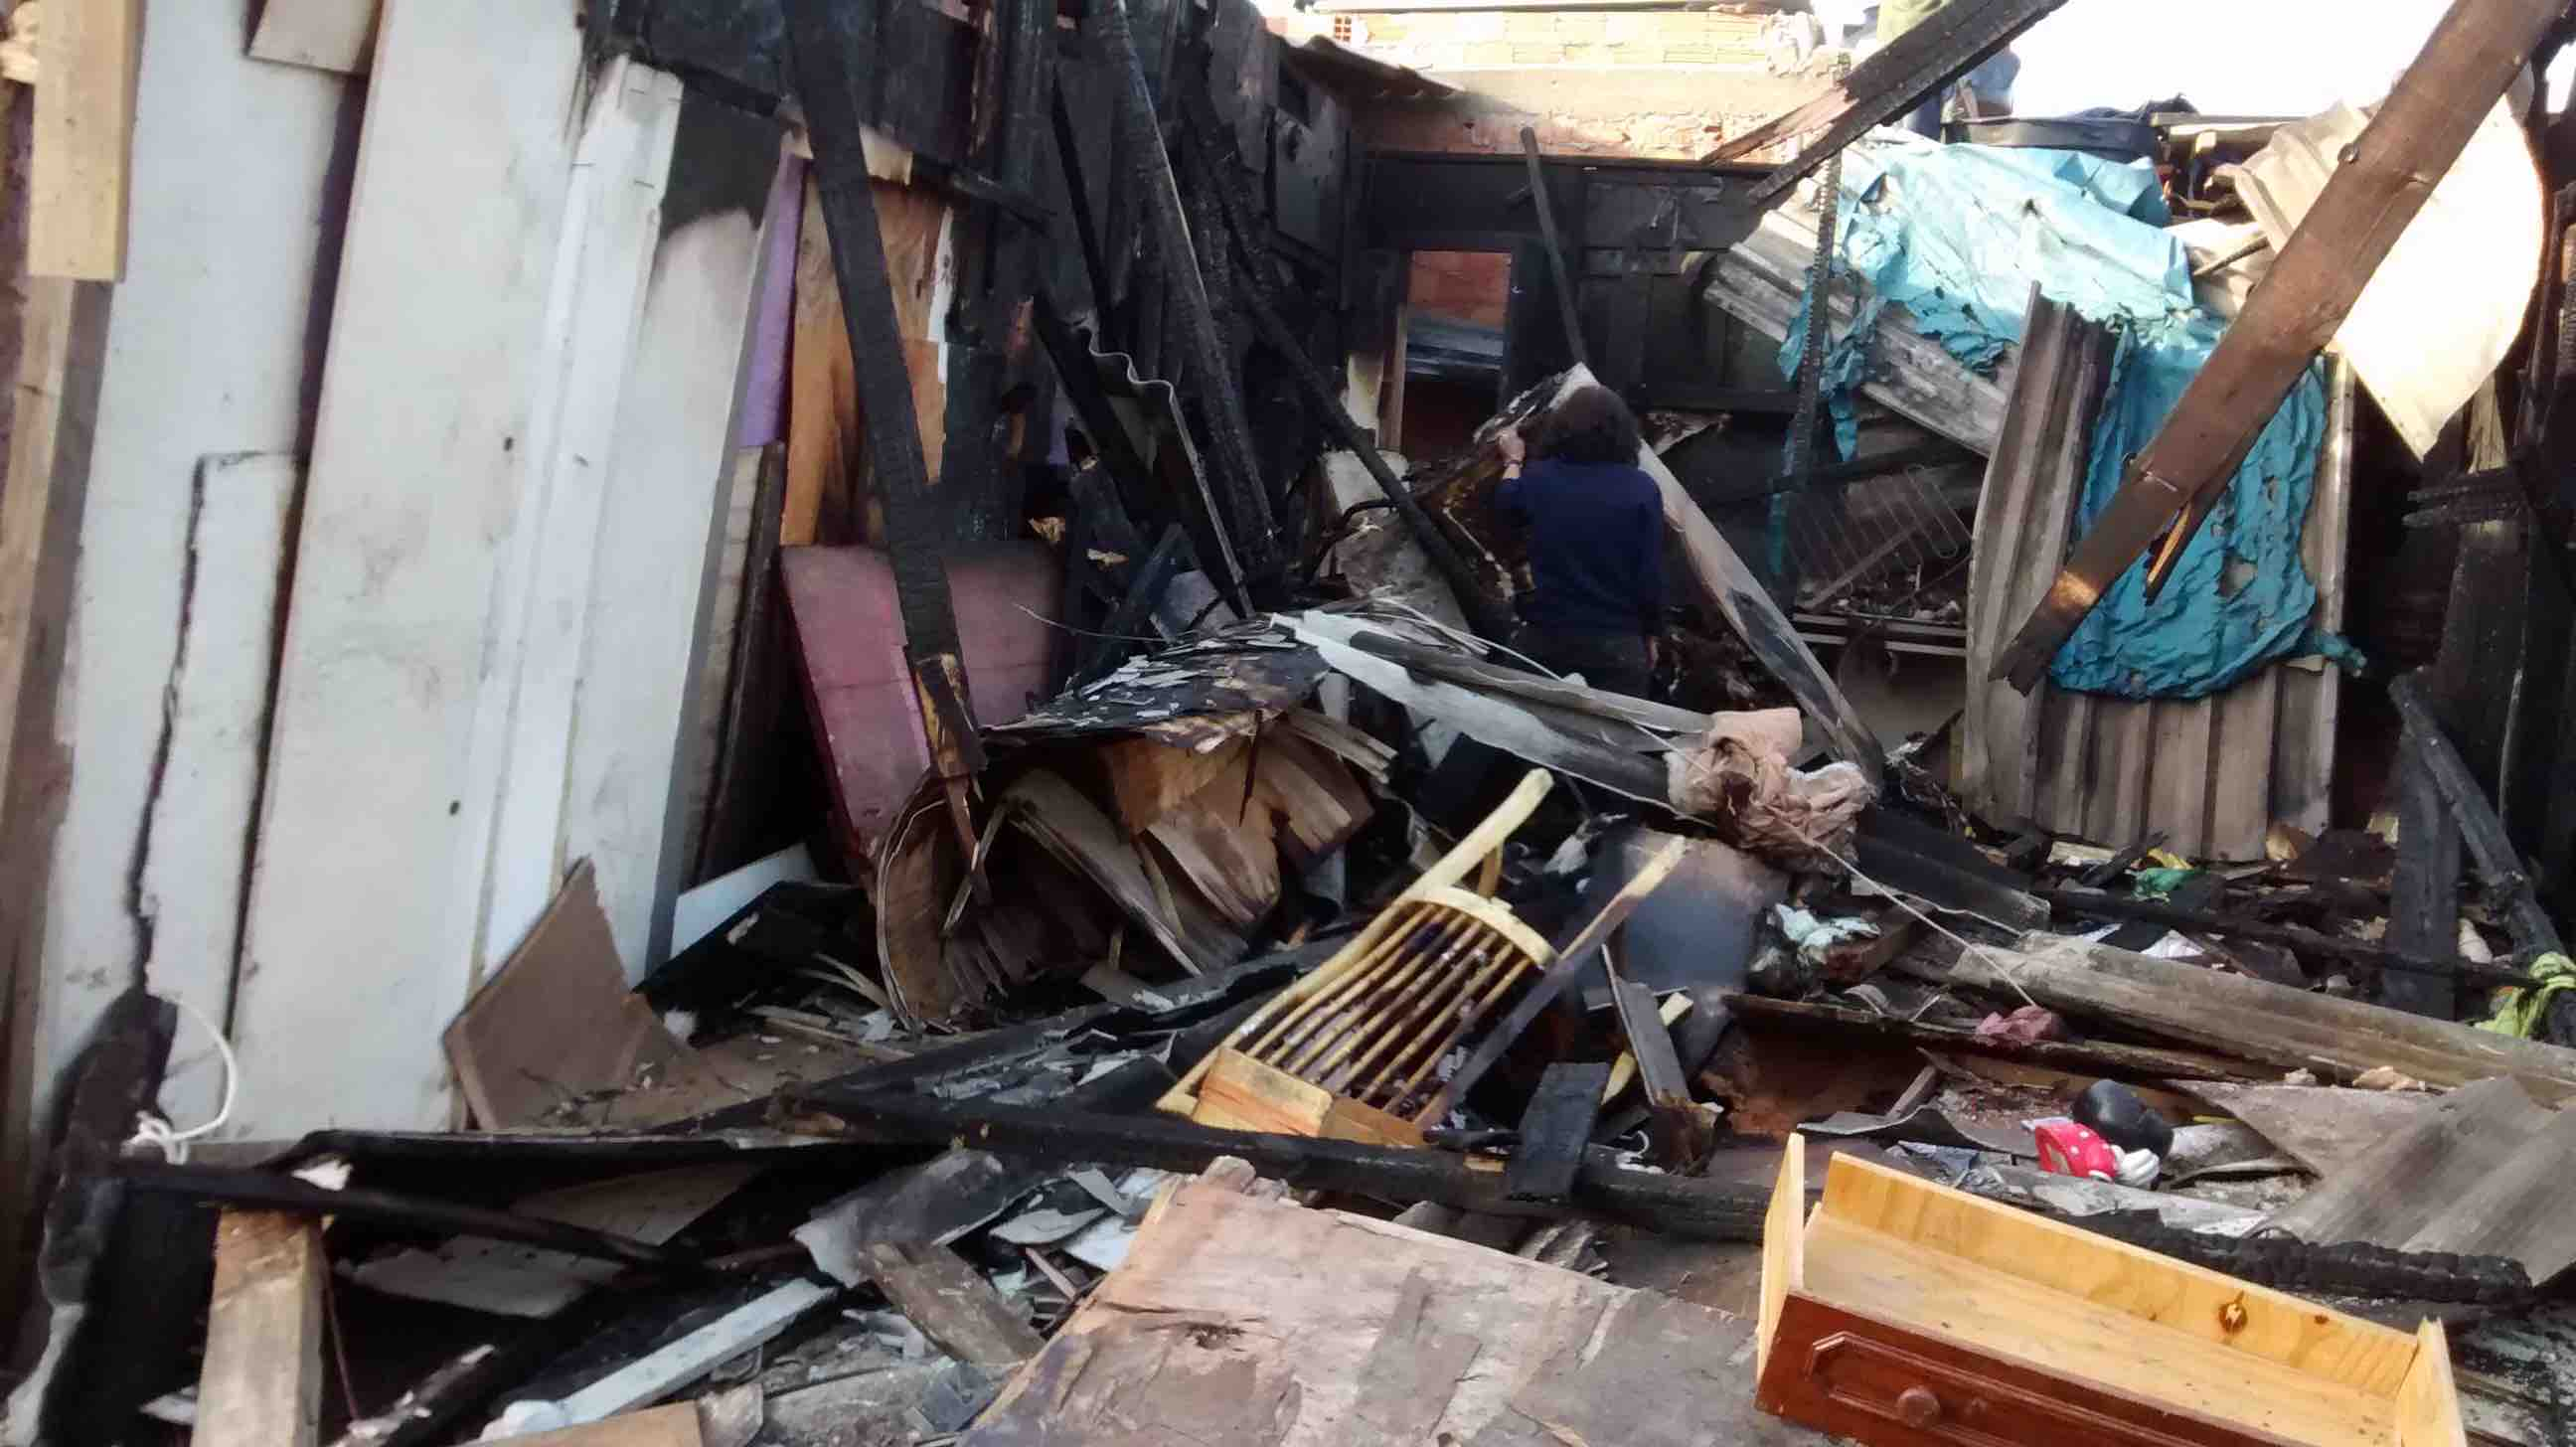 20160719 Caramante favela queimada